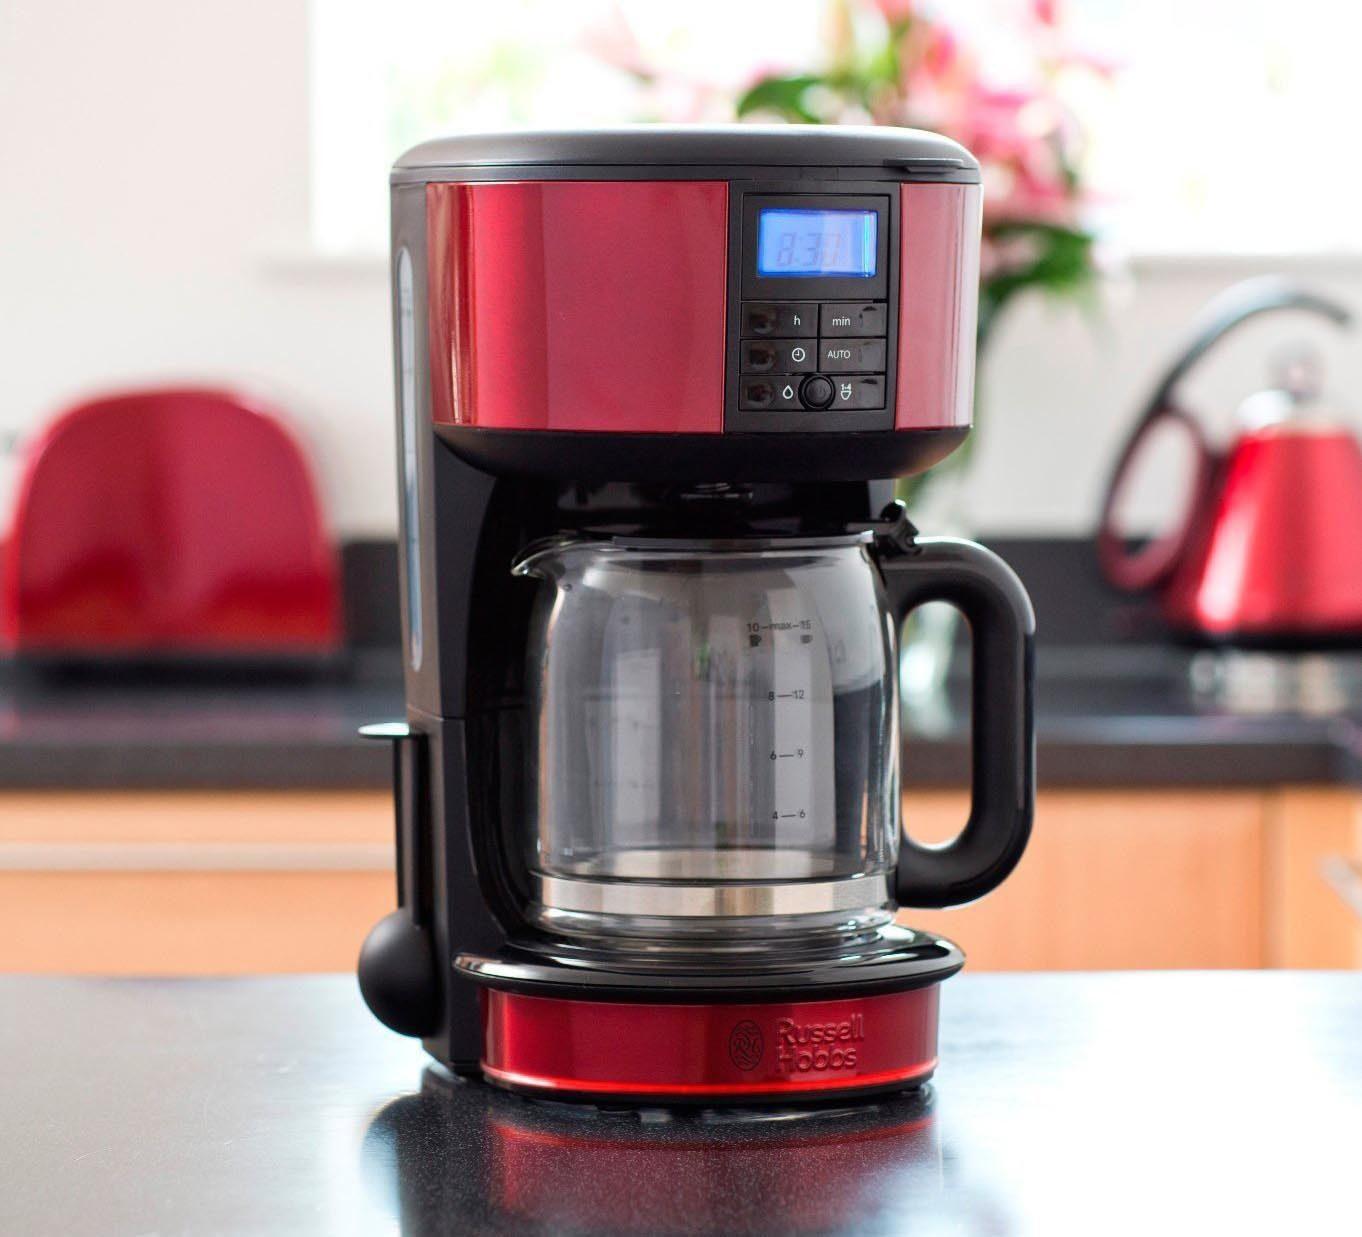 RUSSELL HOBBS Filterkaffeemaschine 20682-56 Legacy Red, 1,25l Kaffeekanne, Papierfilter 1x4, mit Selbstreinigungsfunktion